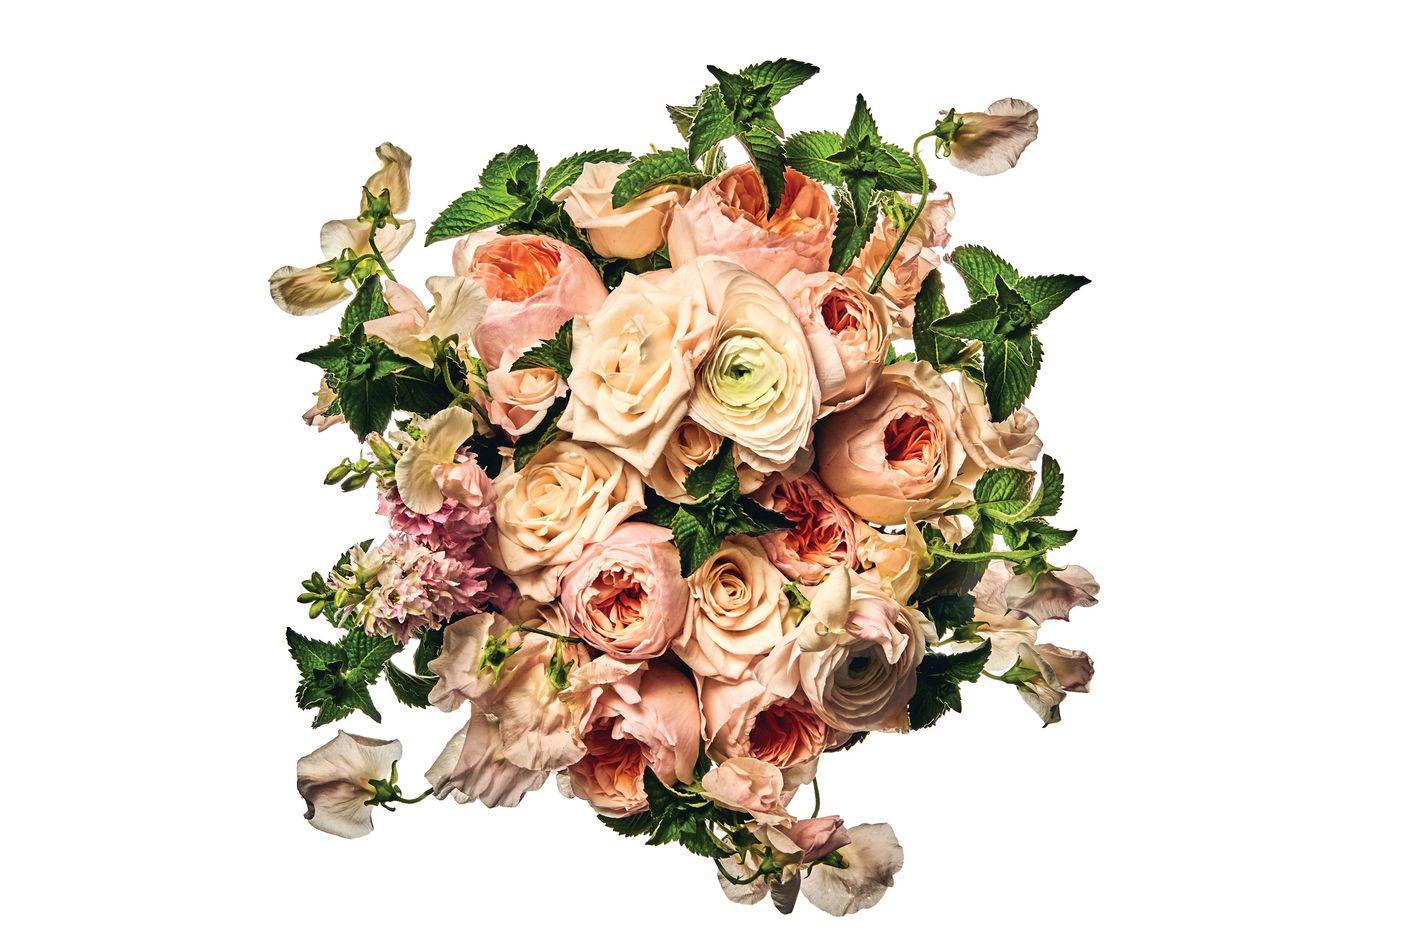 Juliet garden rose, Champagne rose, Clooney Hanoi ranunculus, sweet pea, larkspur, and mint